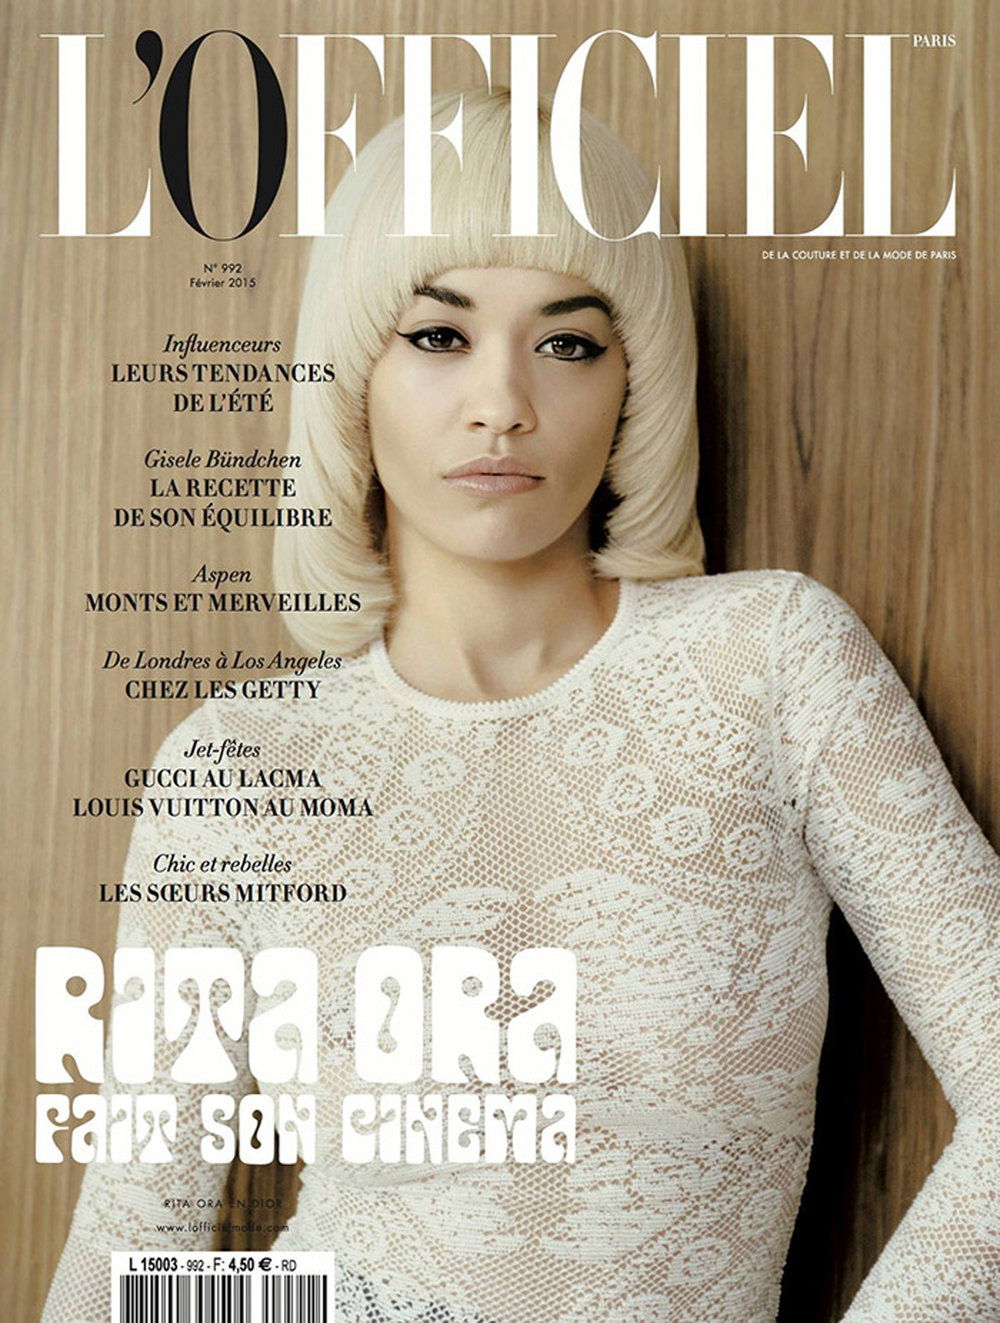 rita-ora-lofficiel-paris-february-2015-cover.jpg